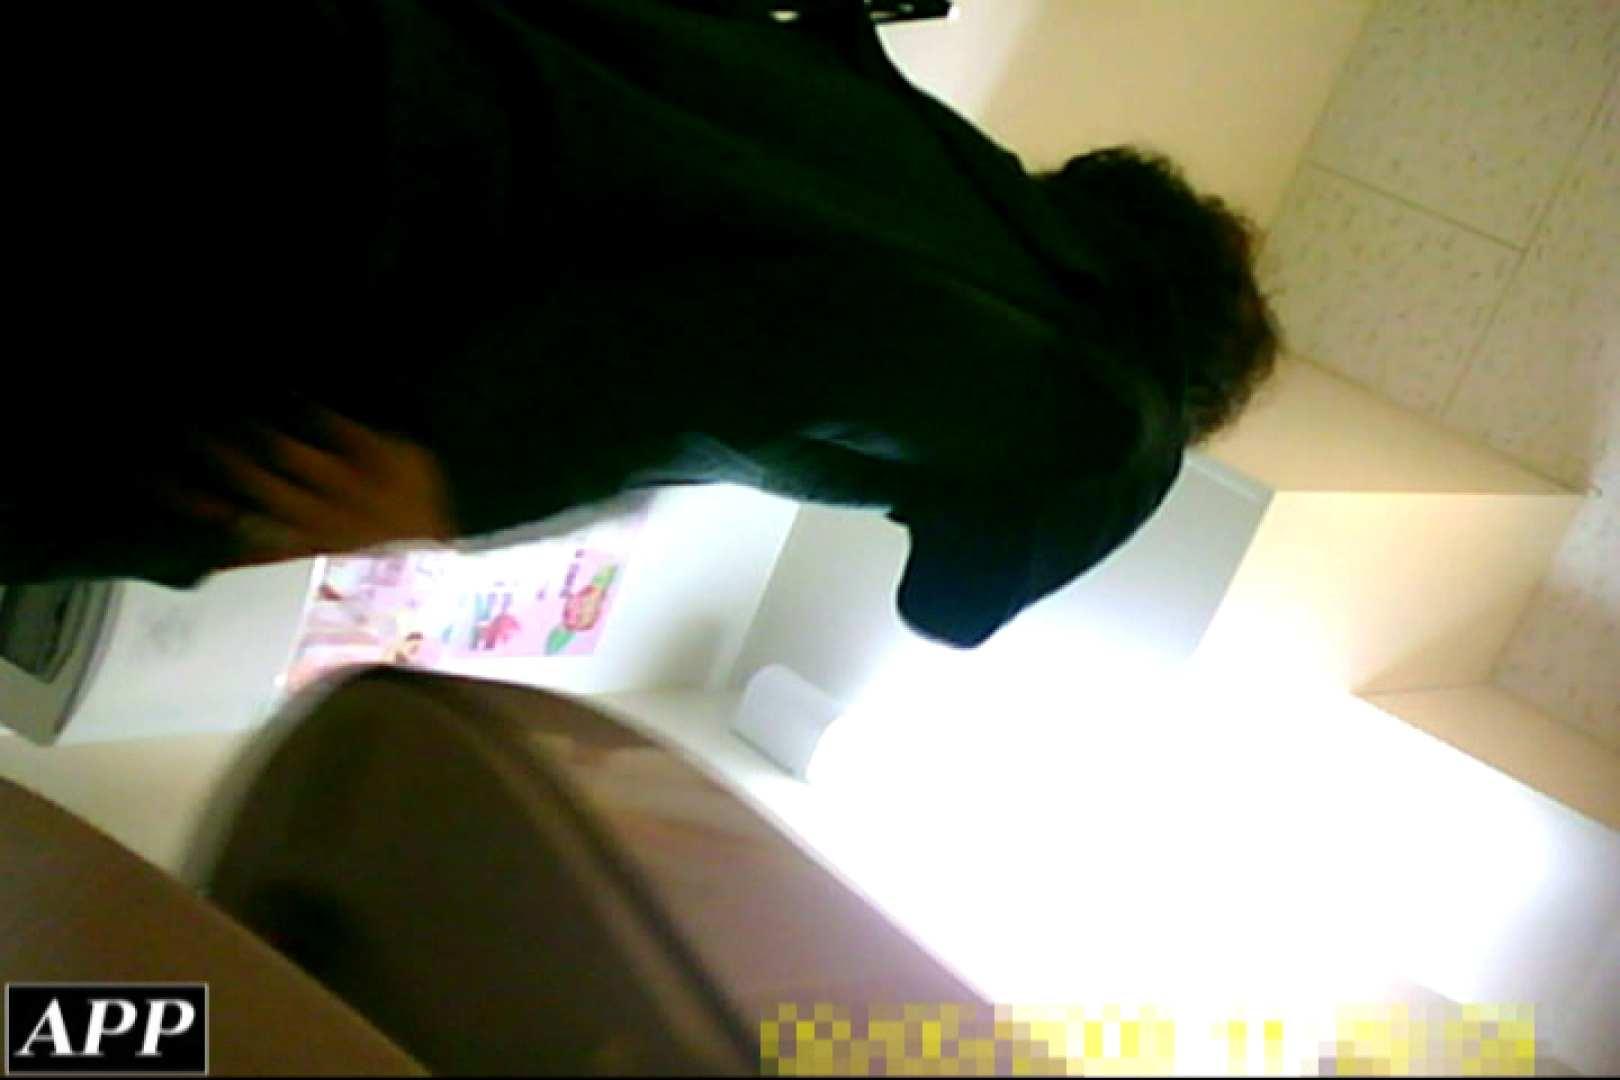 3視点洗面所 vol.119 盗撮 セックス画像 101PIX 88